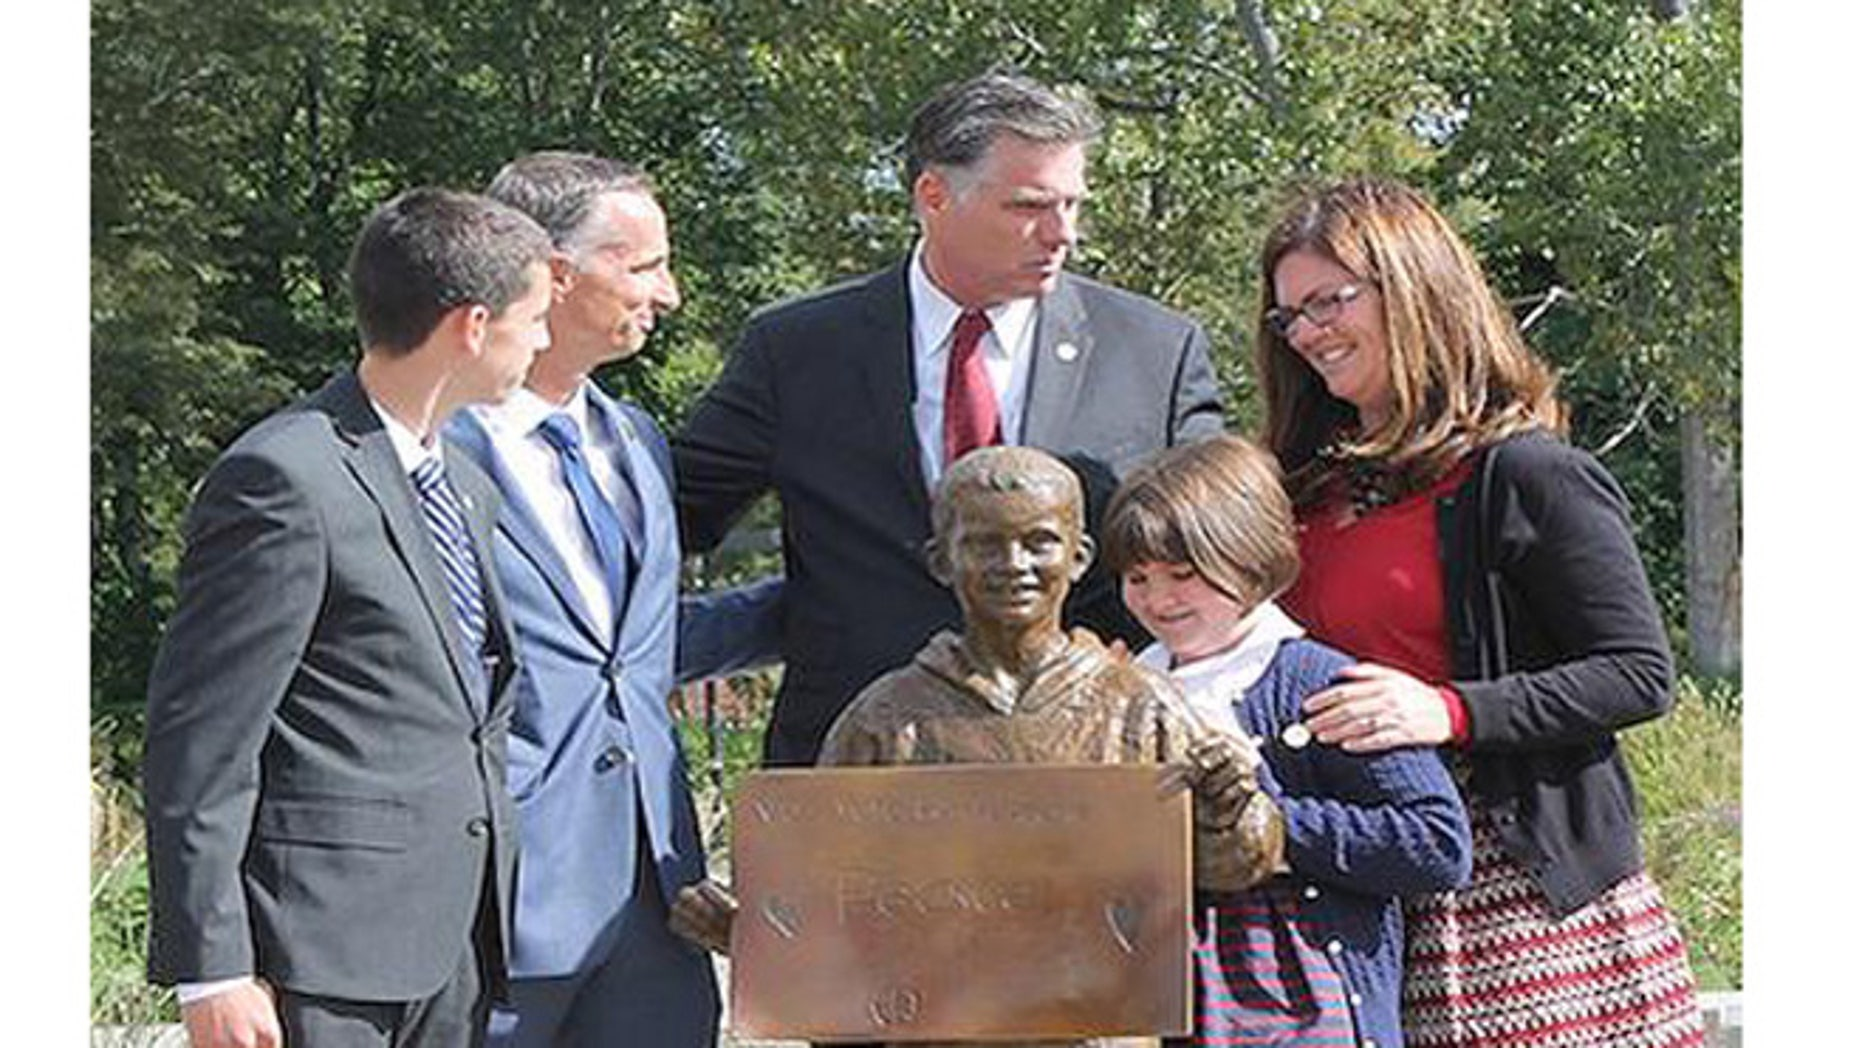 A life-size sculpture of Boston Marathon bombing victim Martin Richard unveiled Saturday Sept. 26, 2015, at Bridgewater State University.(John Waters/BSU)